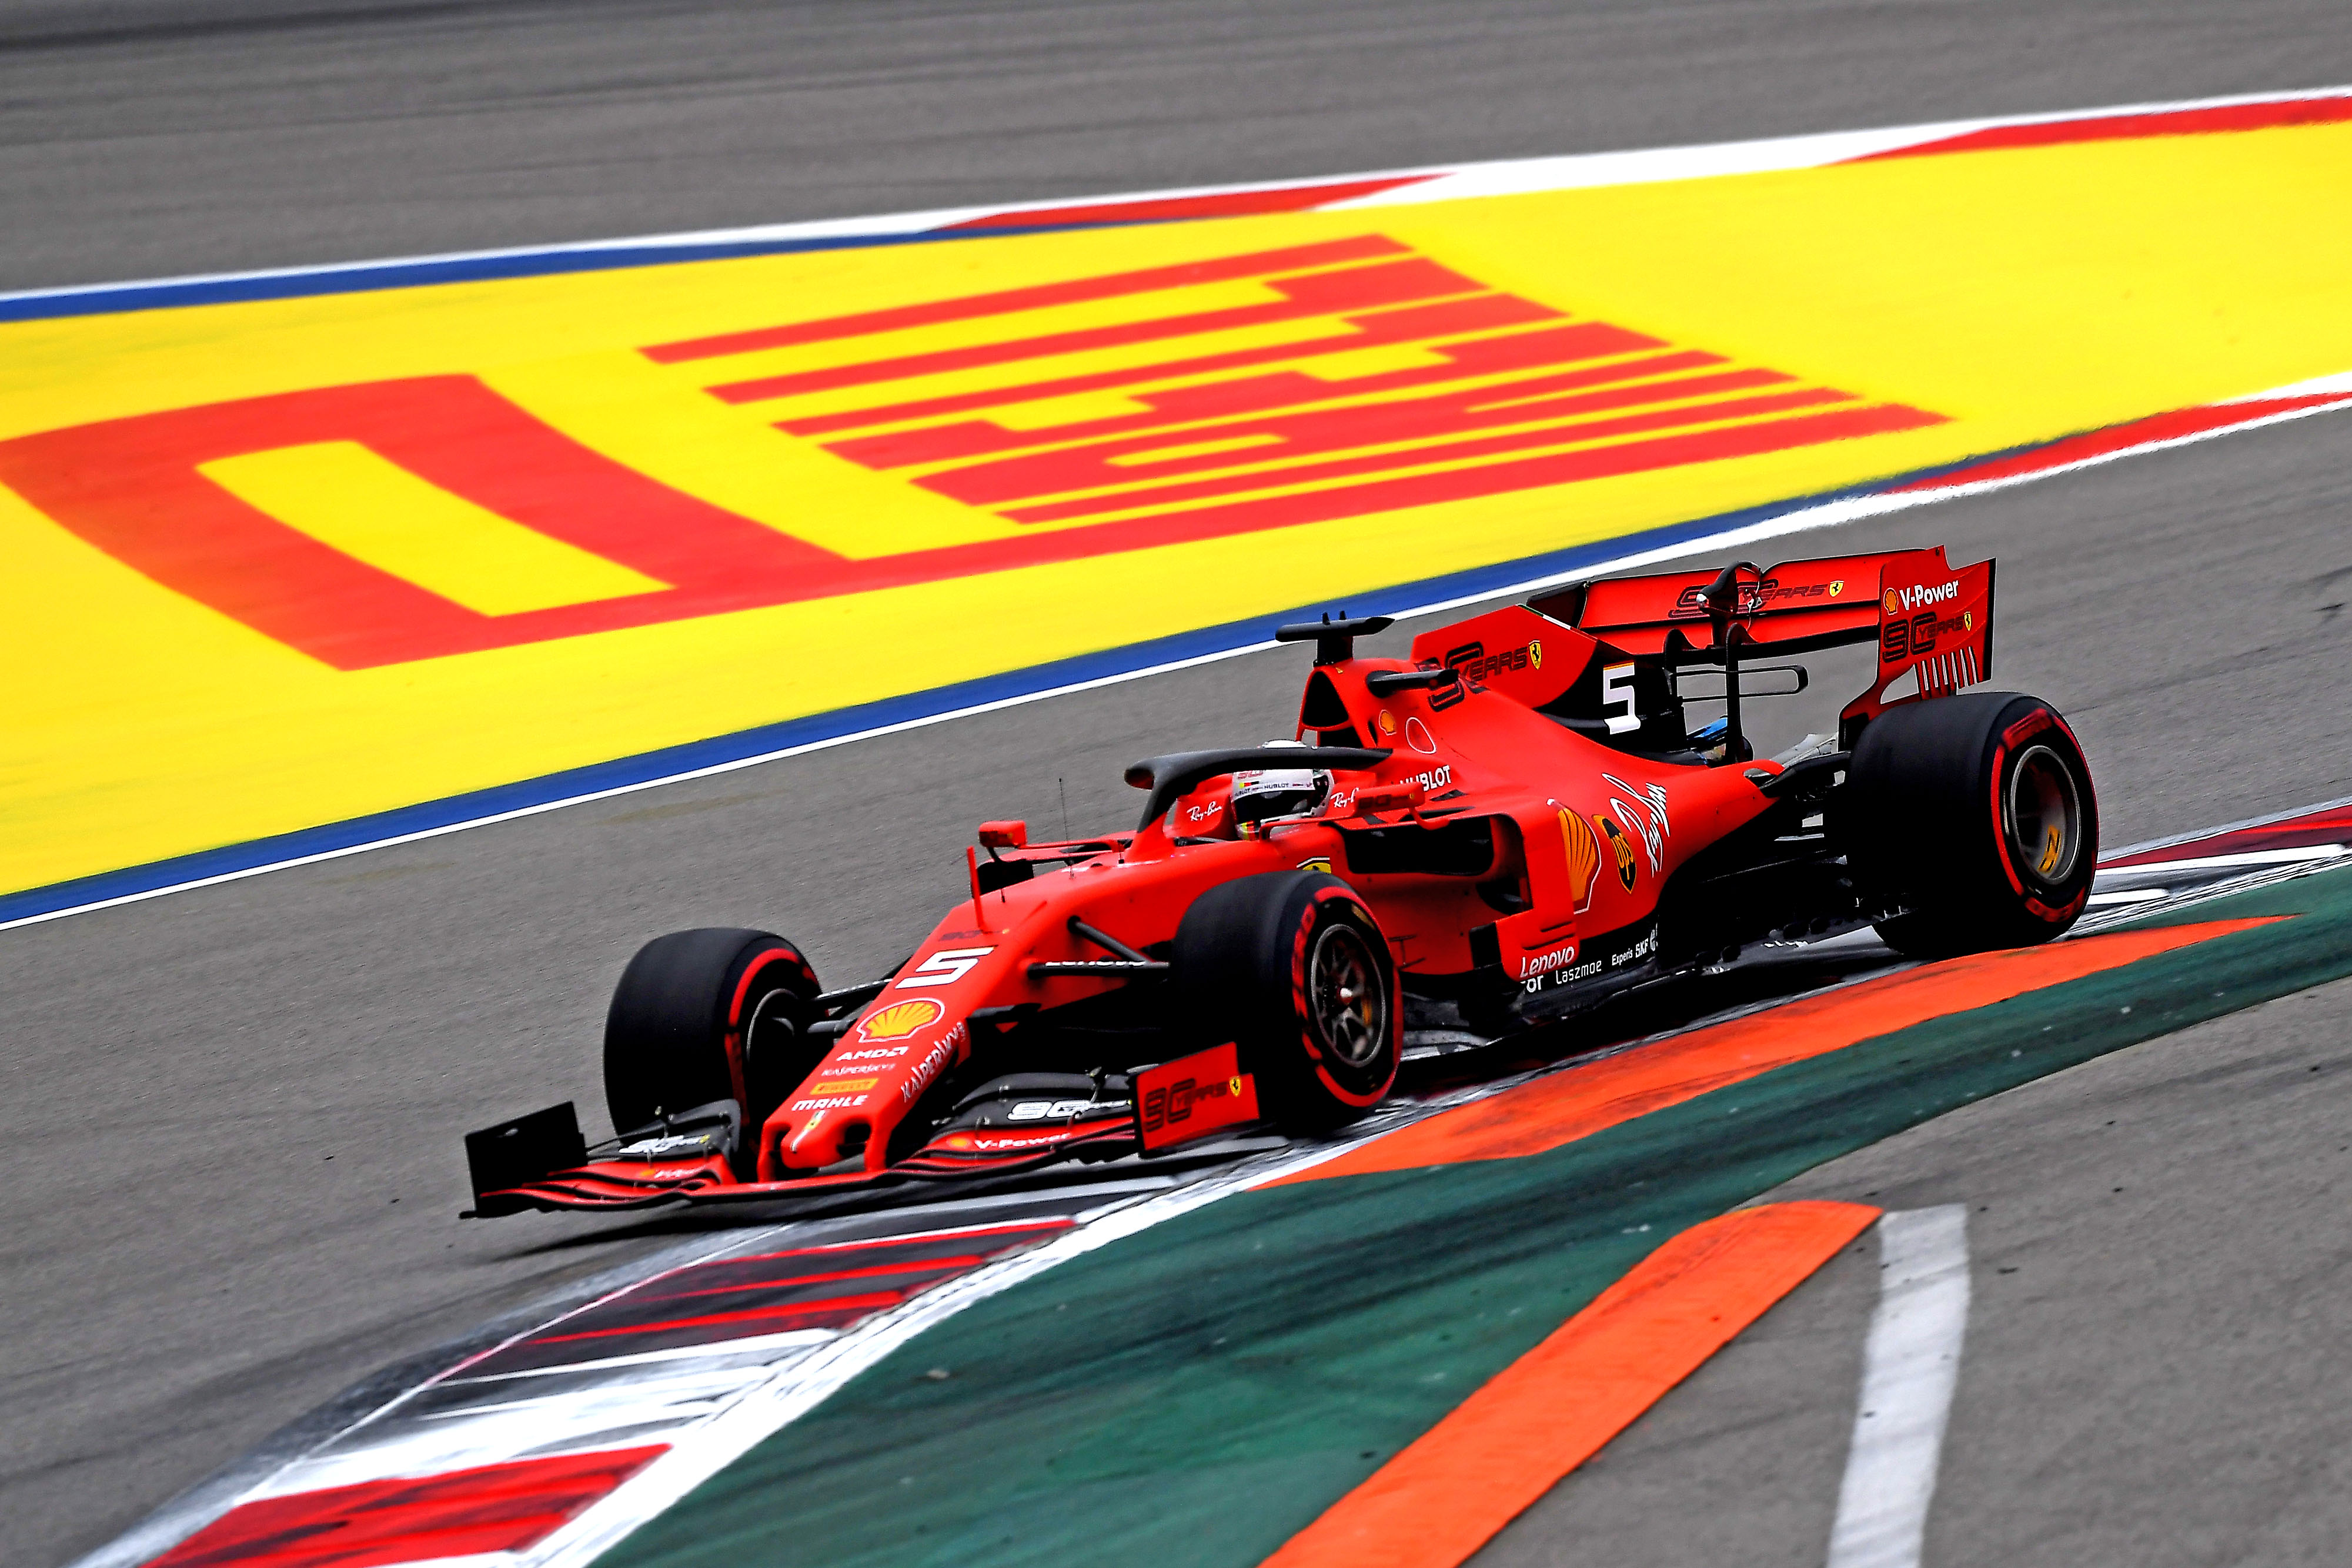 F1 Ergebniss